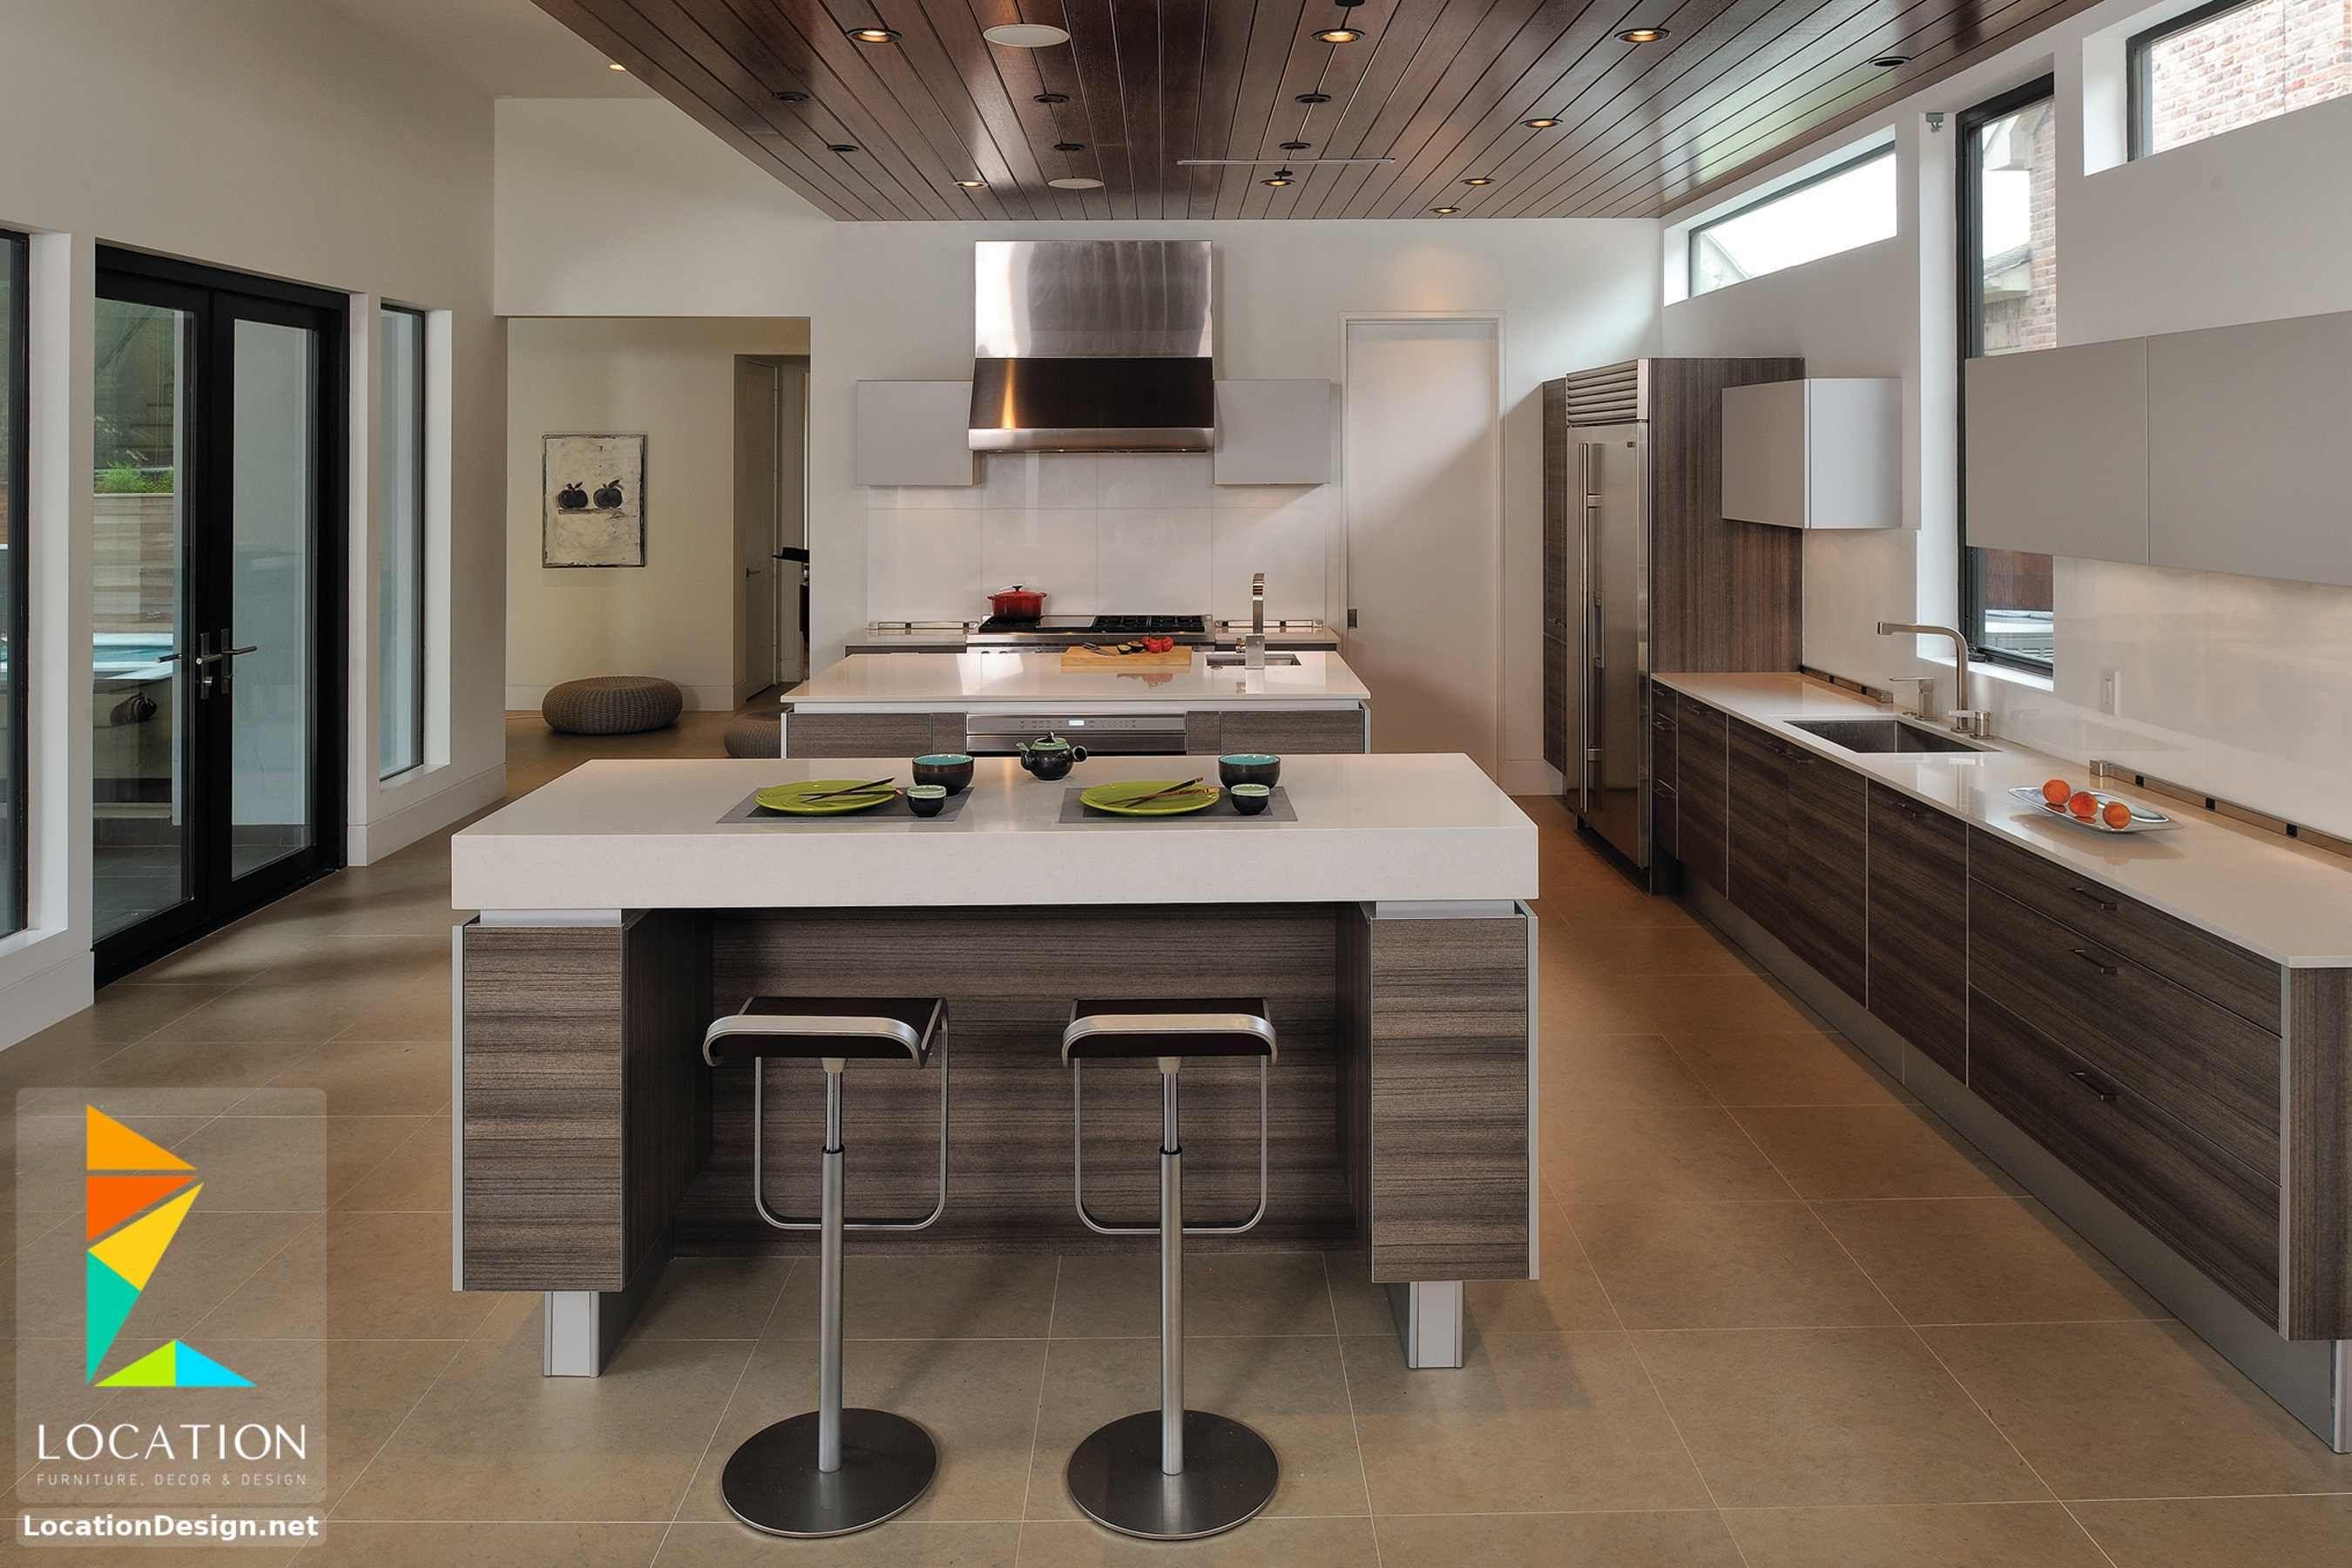 ديكورات مطابخ مودرن صغيرة 2019 2020 Kitchen Design Trends Luxury Kitchen Design Kitchen Flooring Trends